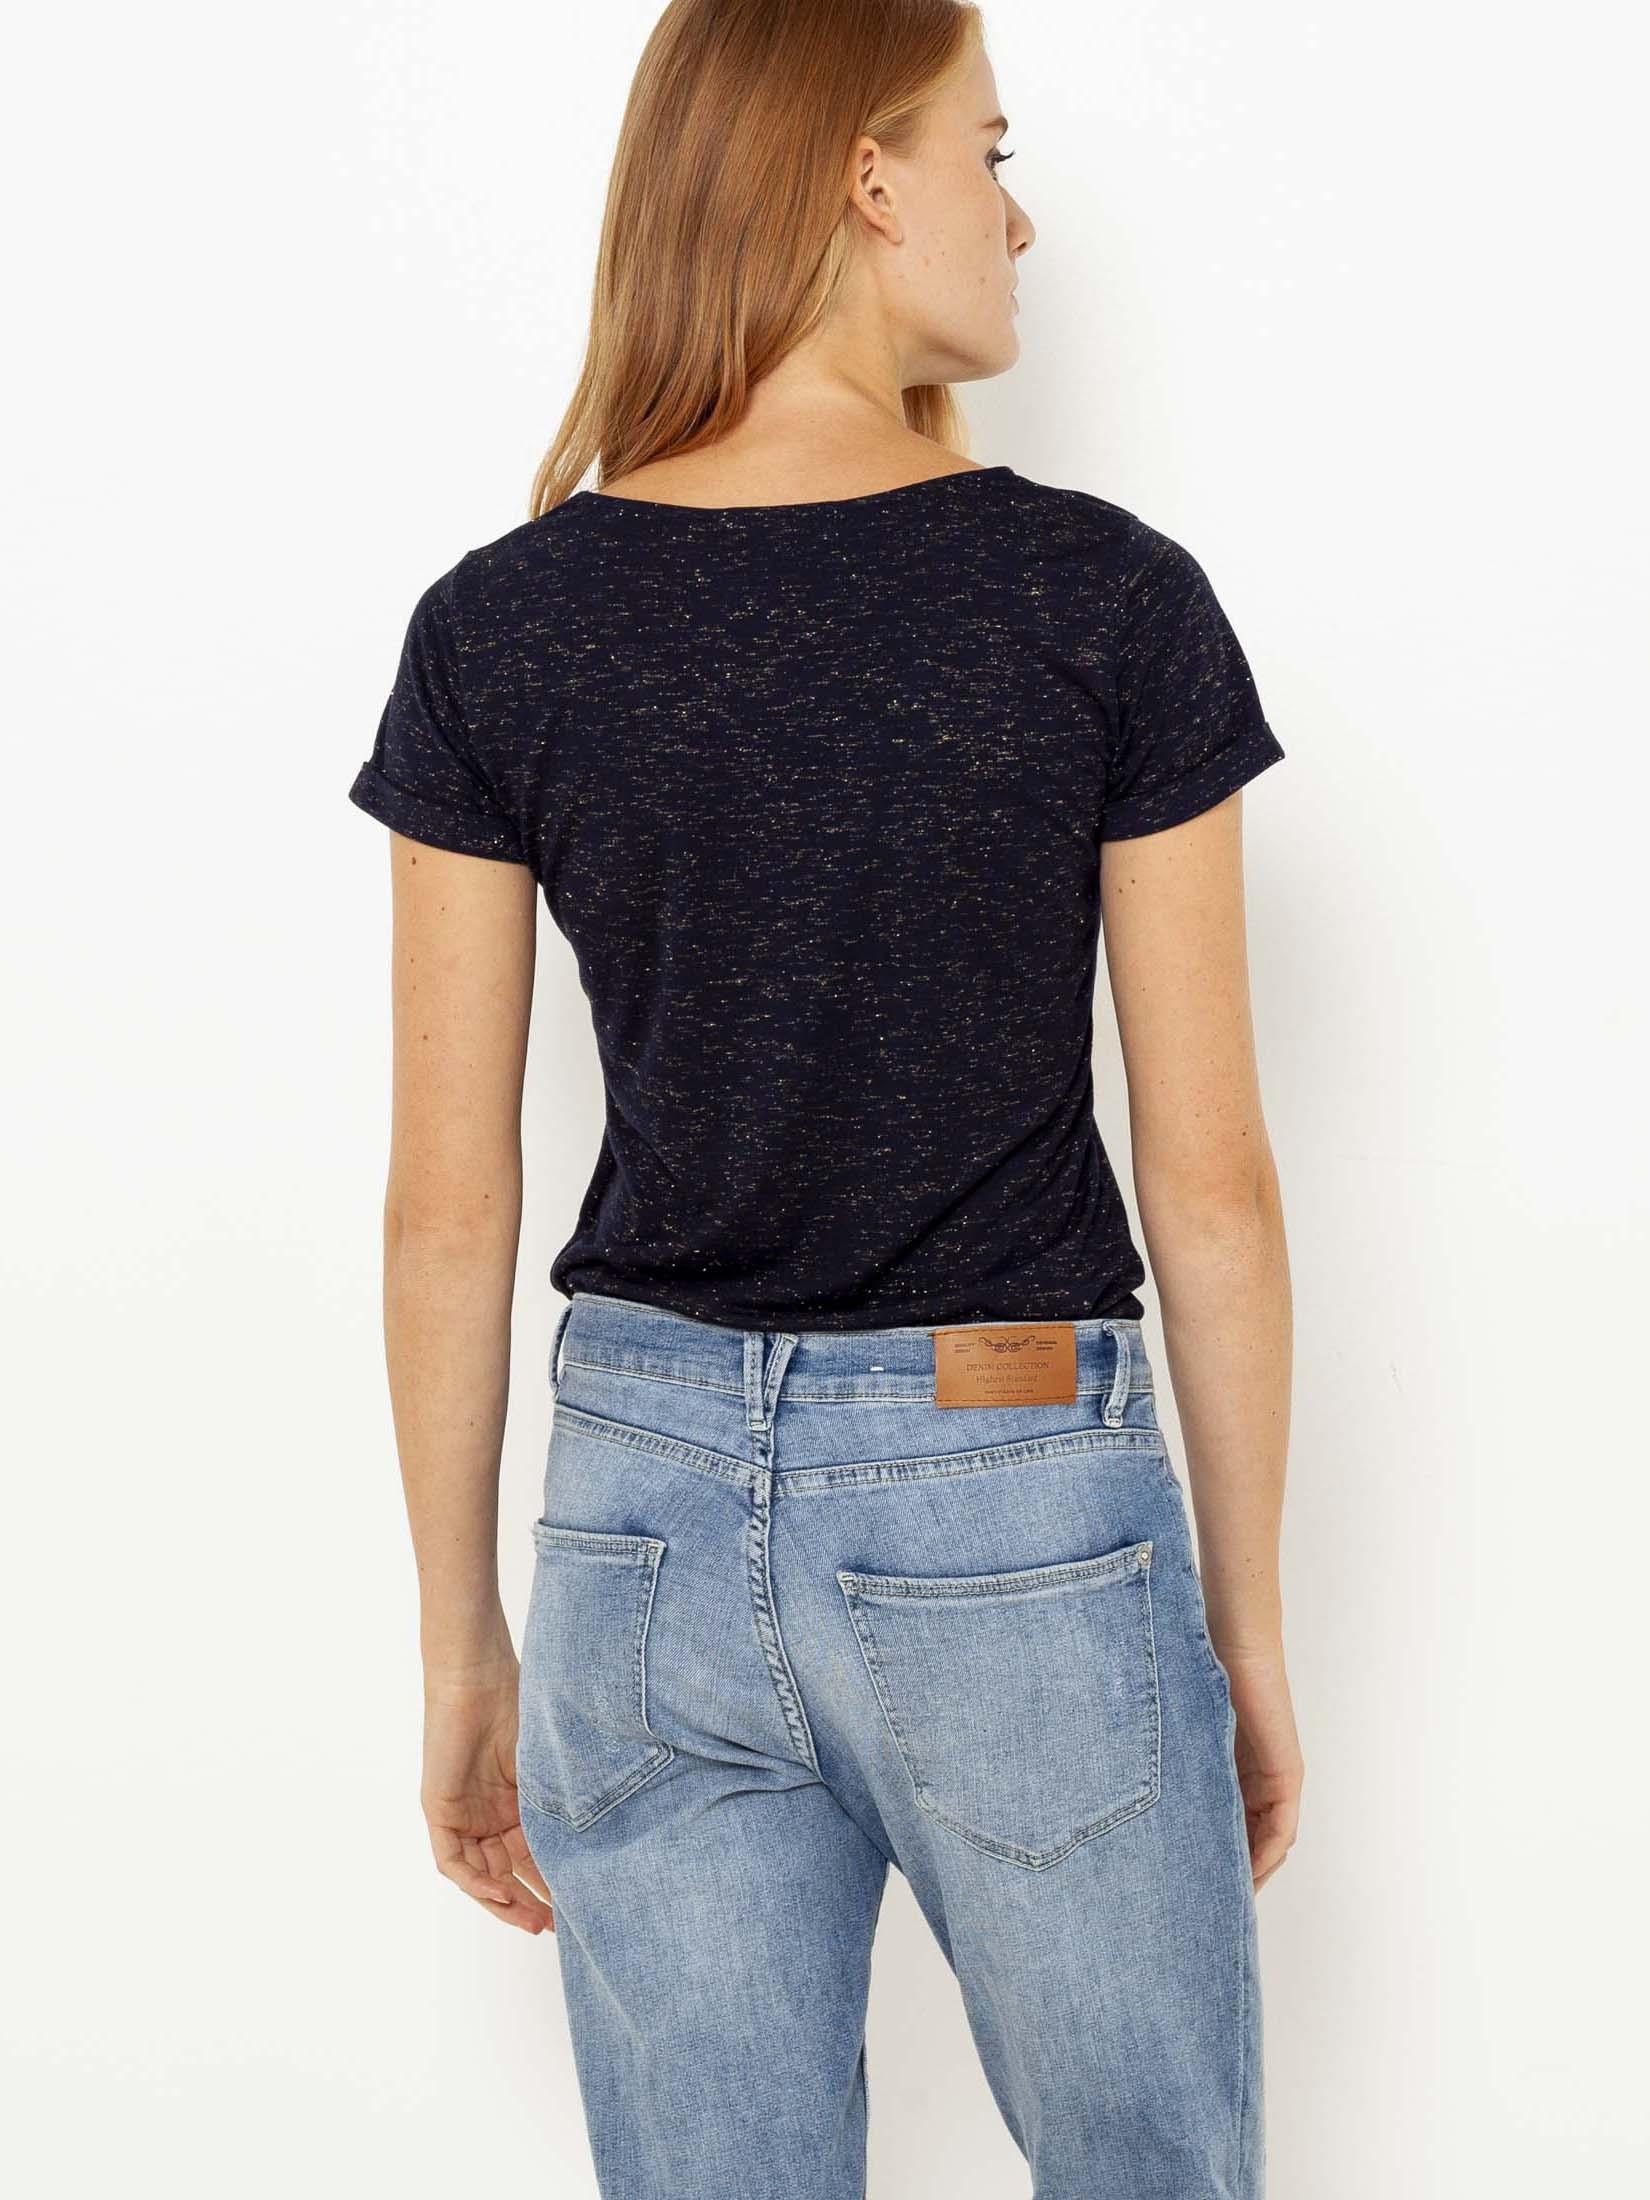 Tricouri pentru femei CAMAIEU - gri inchis